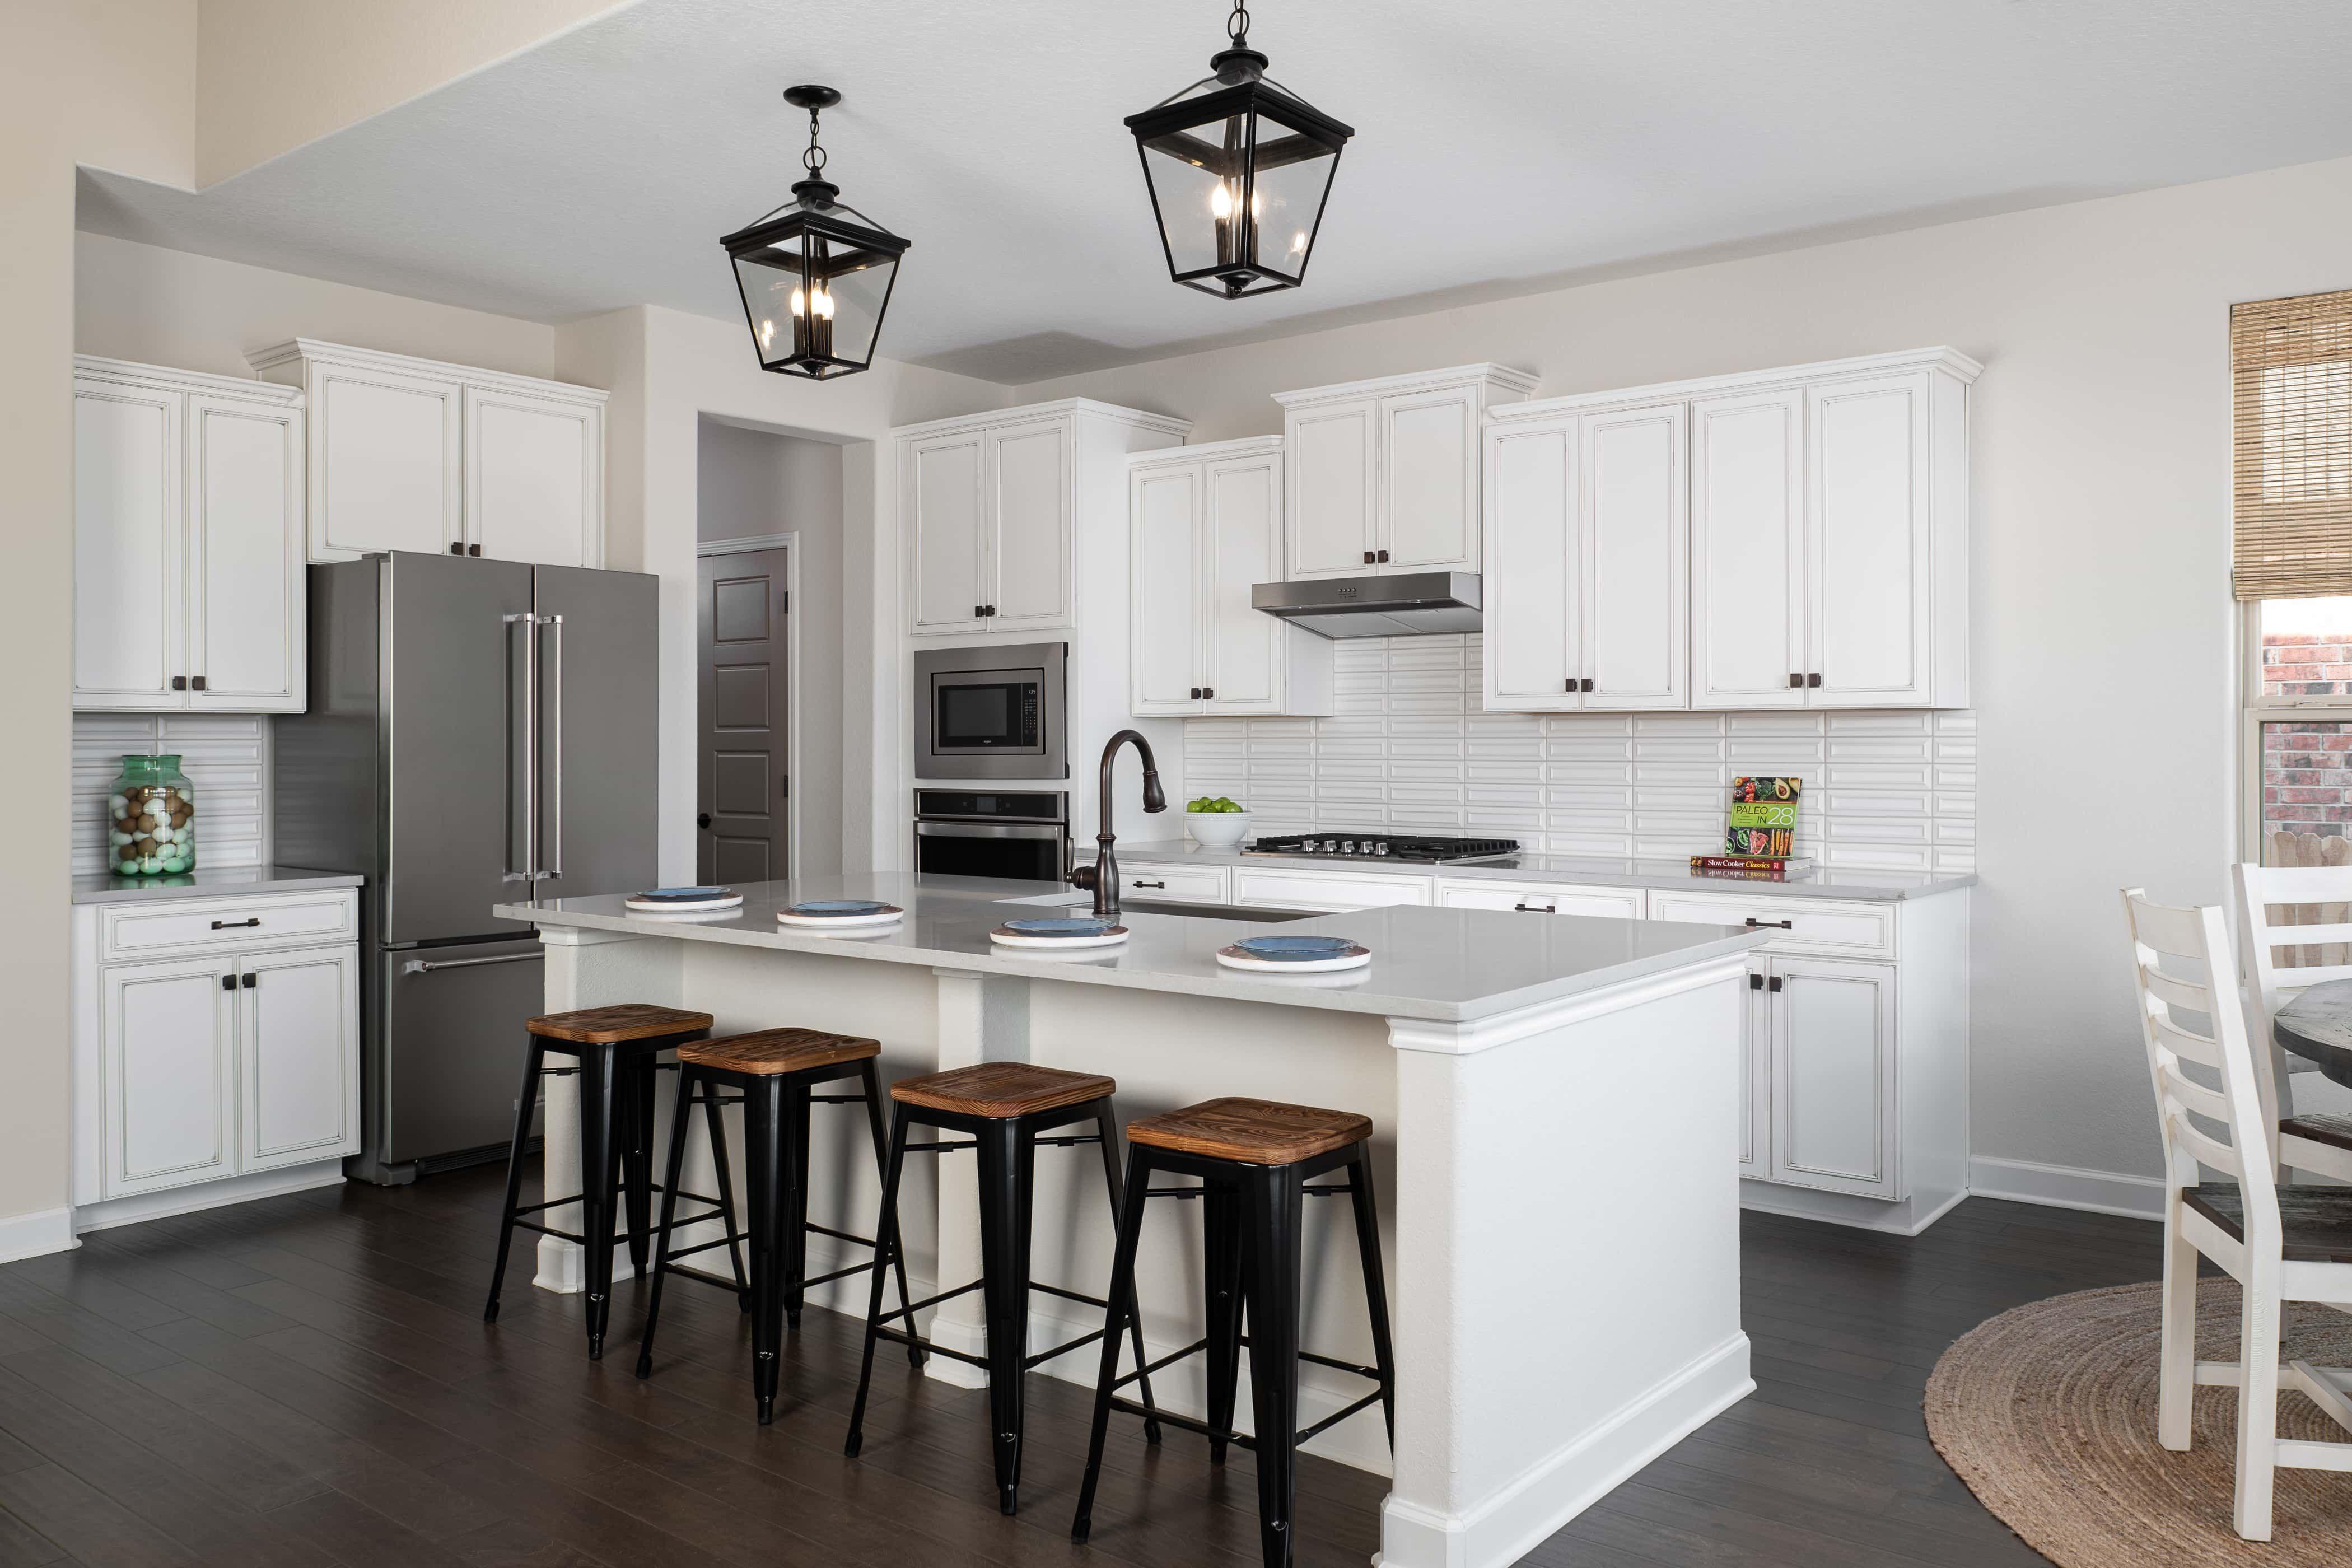 Kitchen featured in the Odessa By Ashton Woods in San Antonio, TX